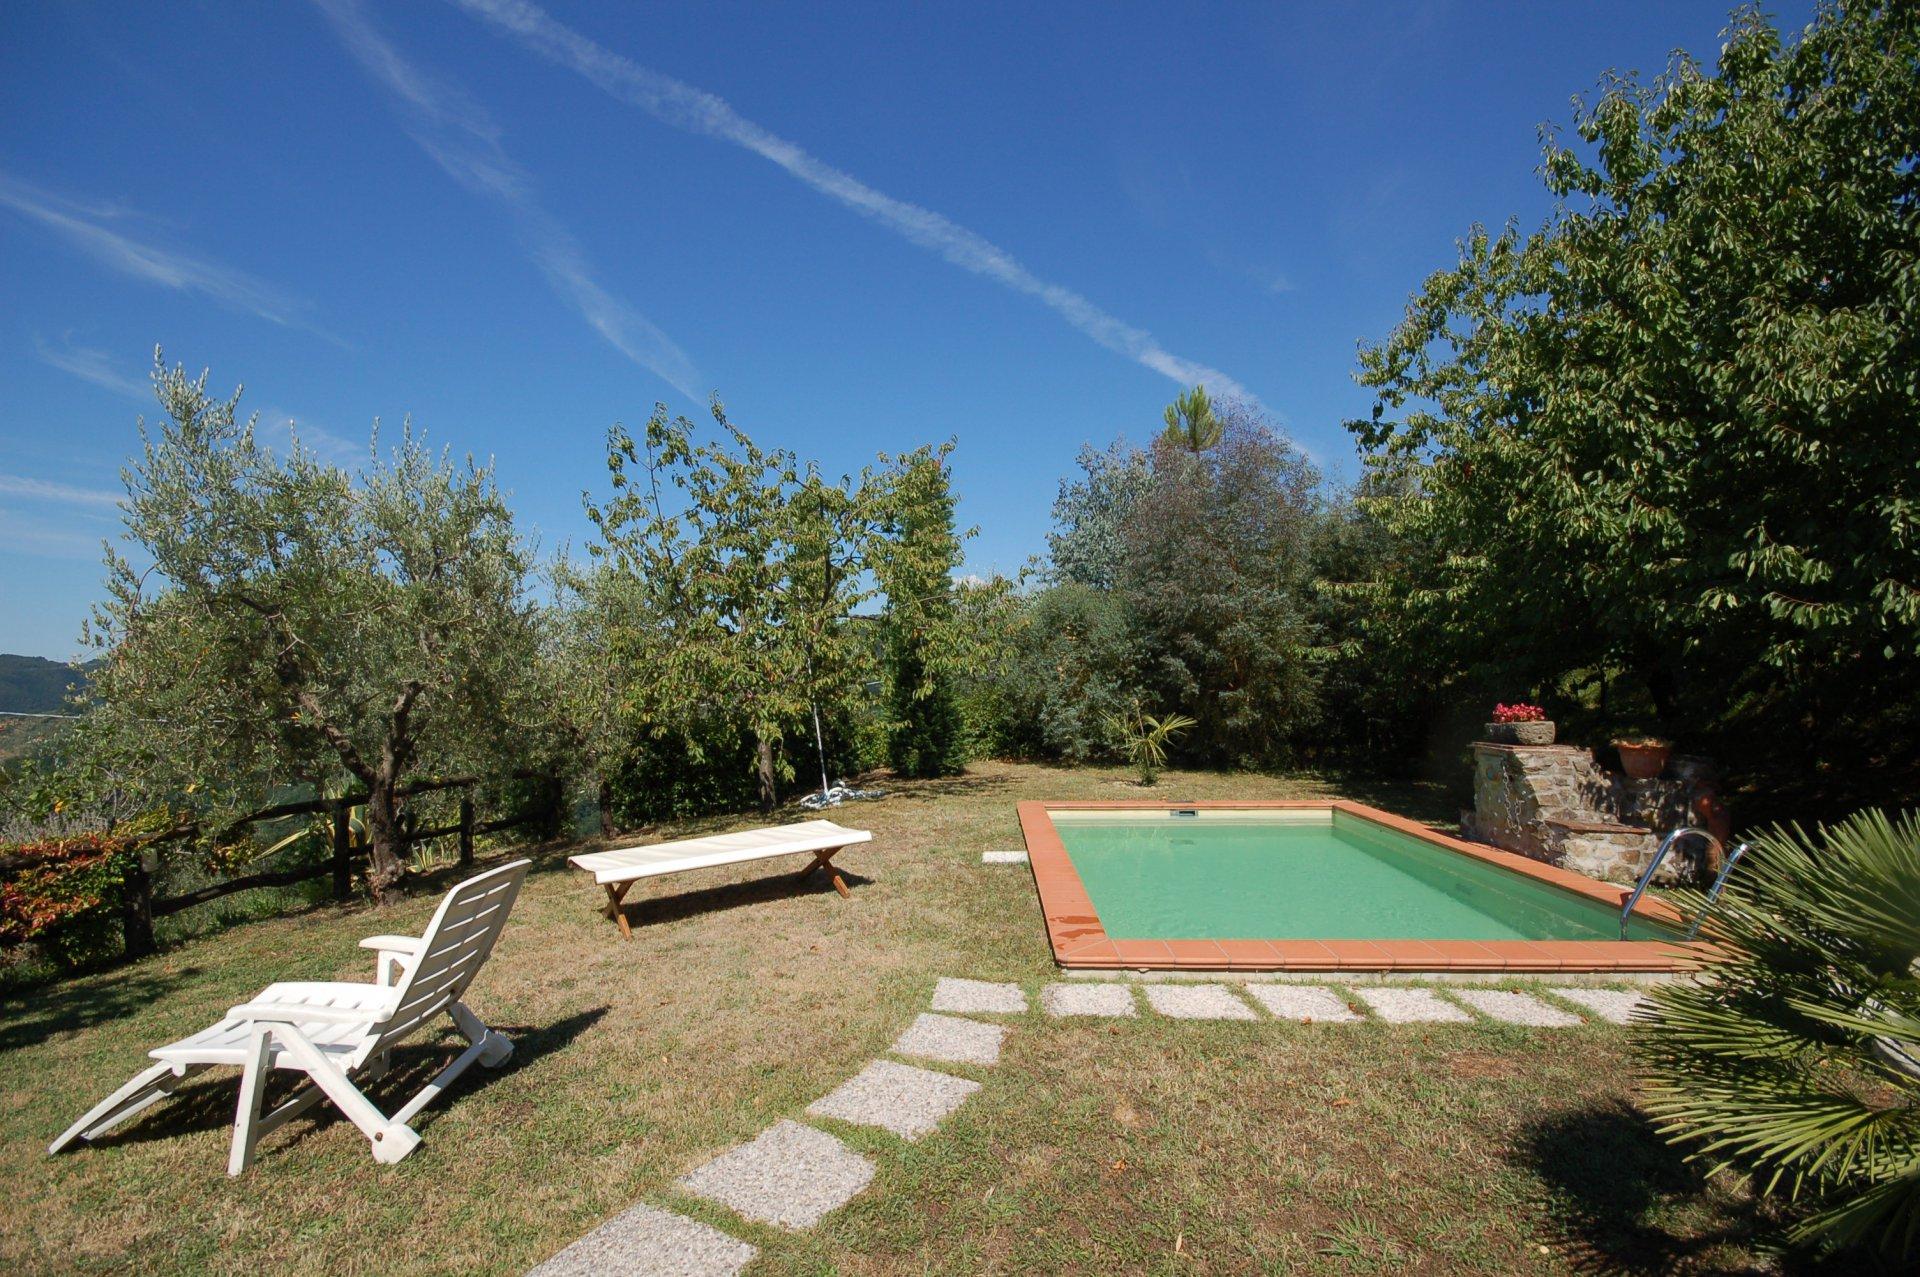 ITALIE, TOSCANE, MONTECATINI TERME, MAISON AVEC PISCINE, 3 PERSONNES